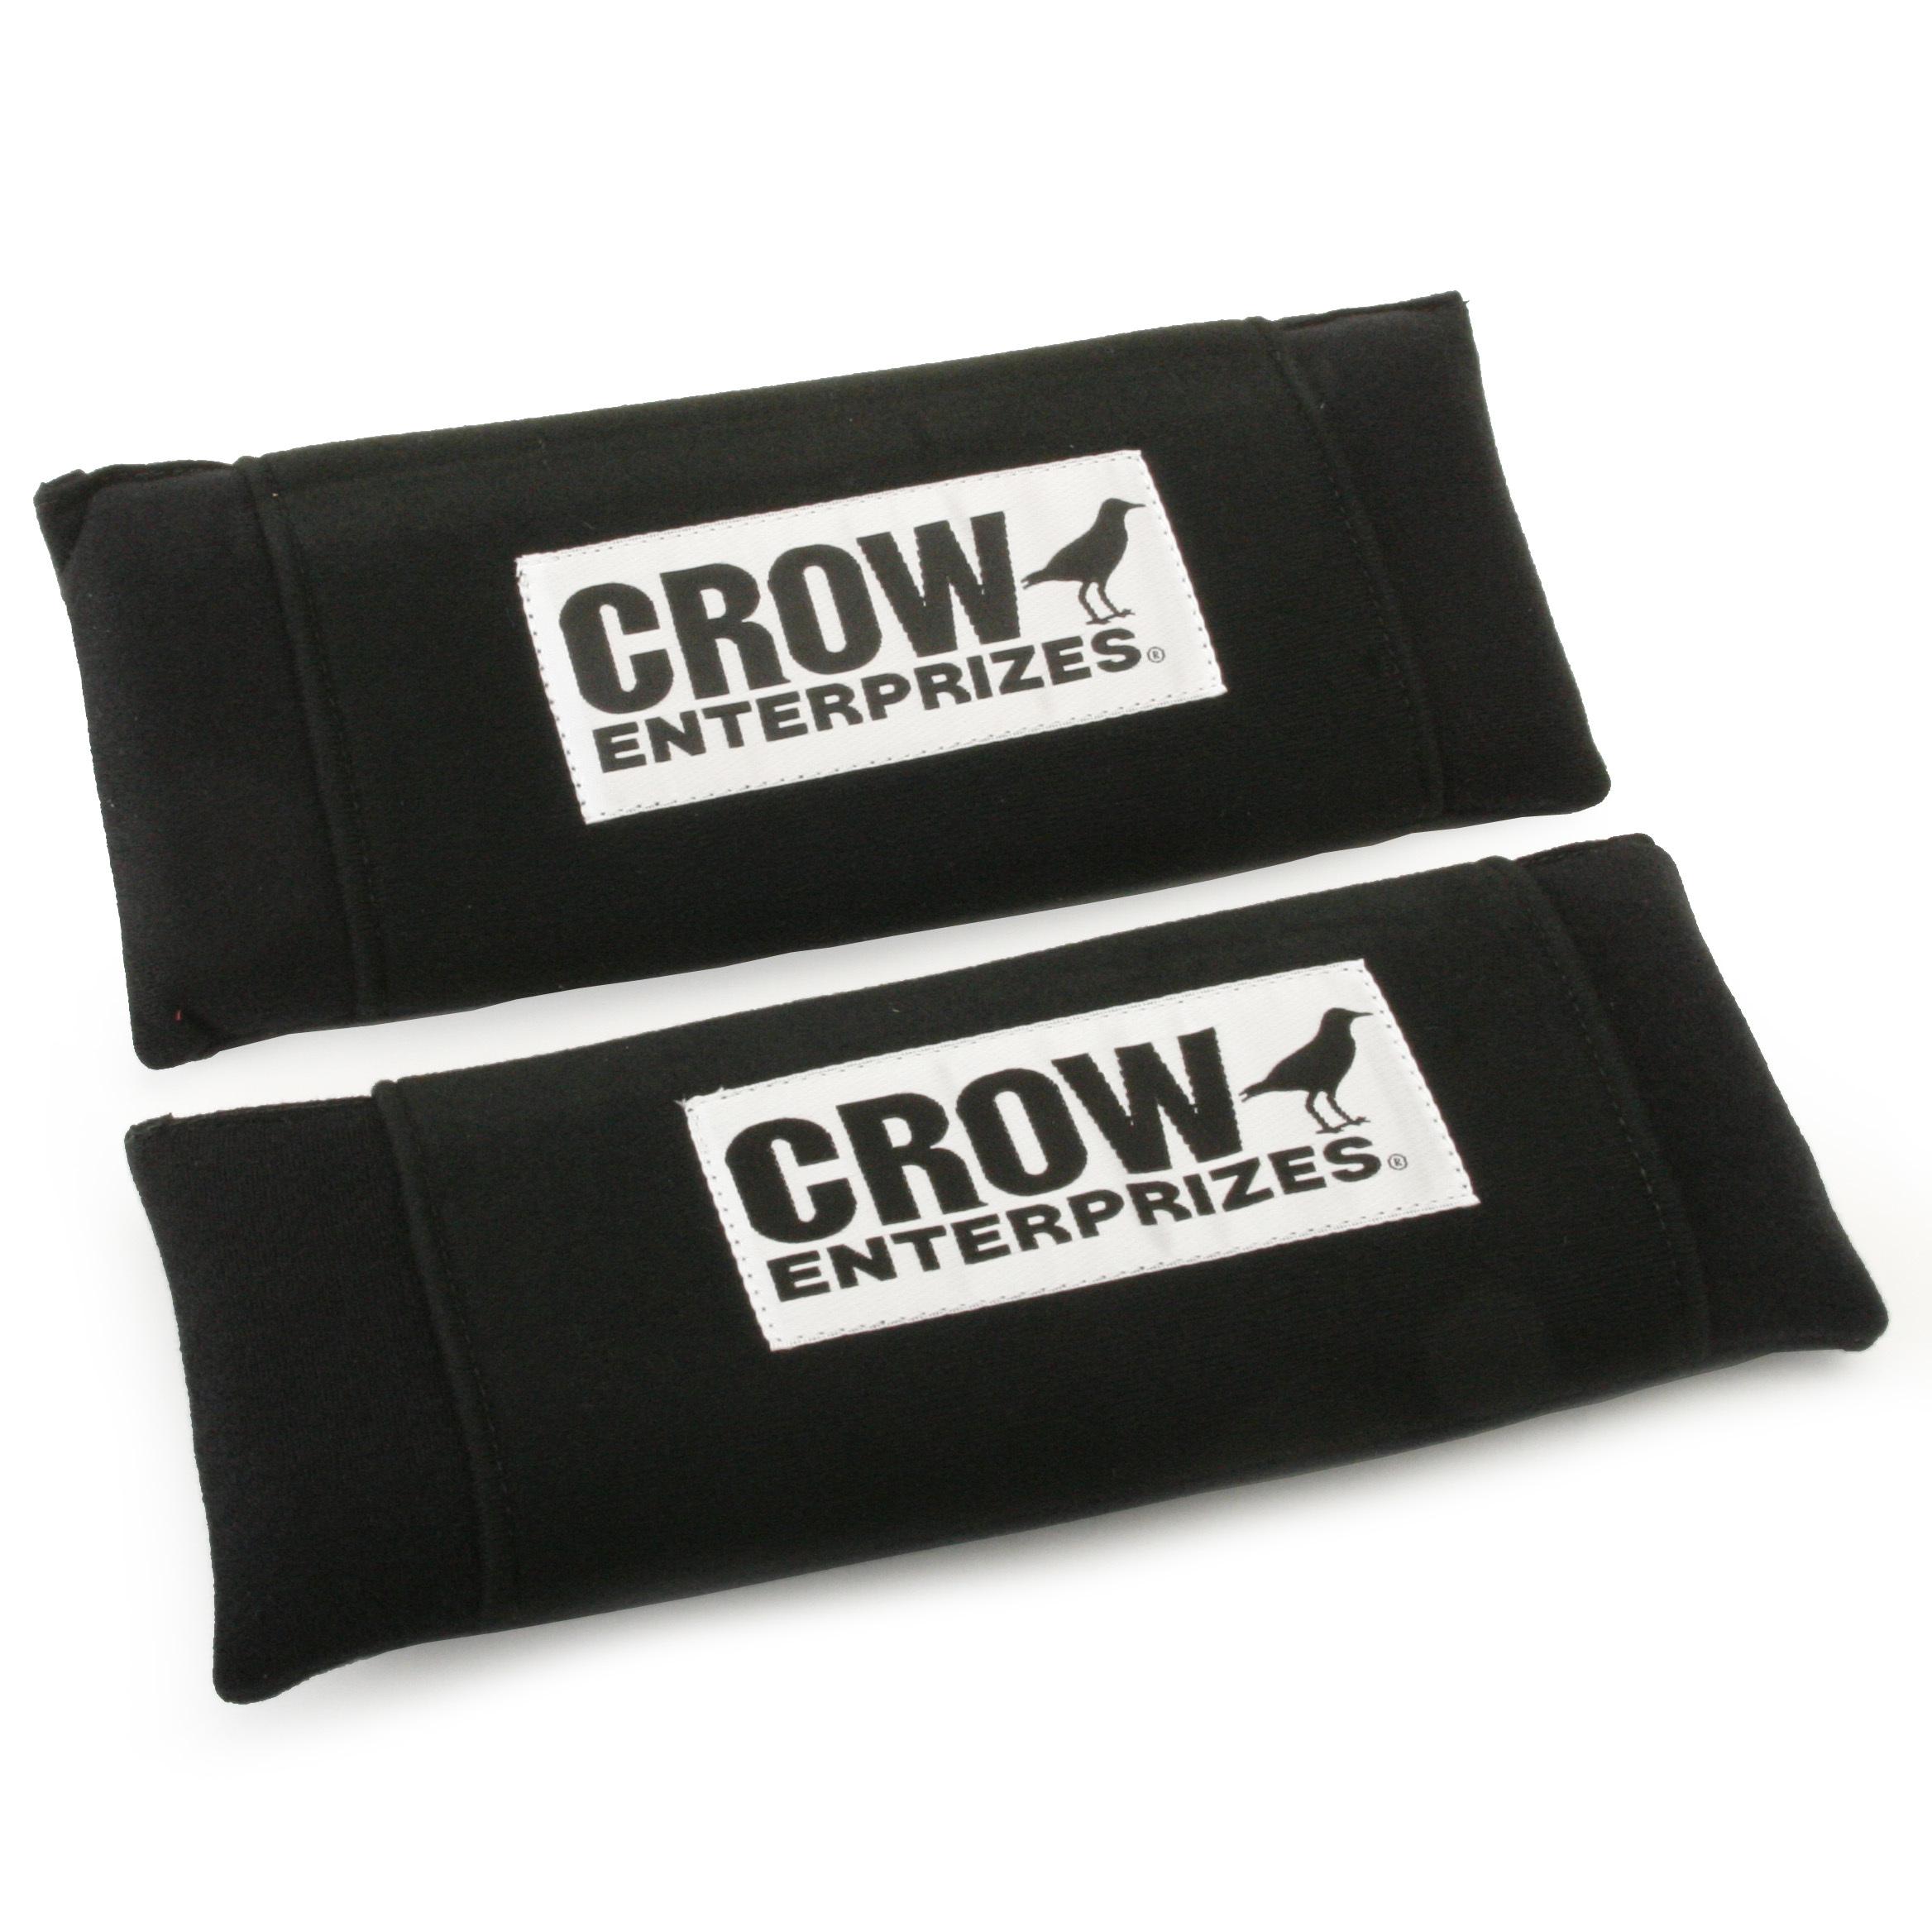 Crow Sub Belts & Pads